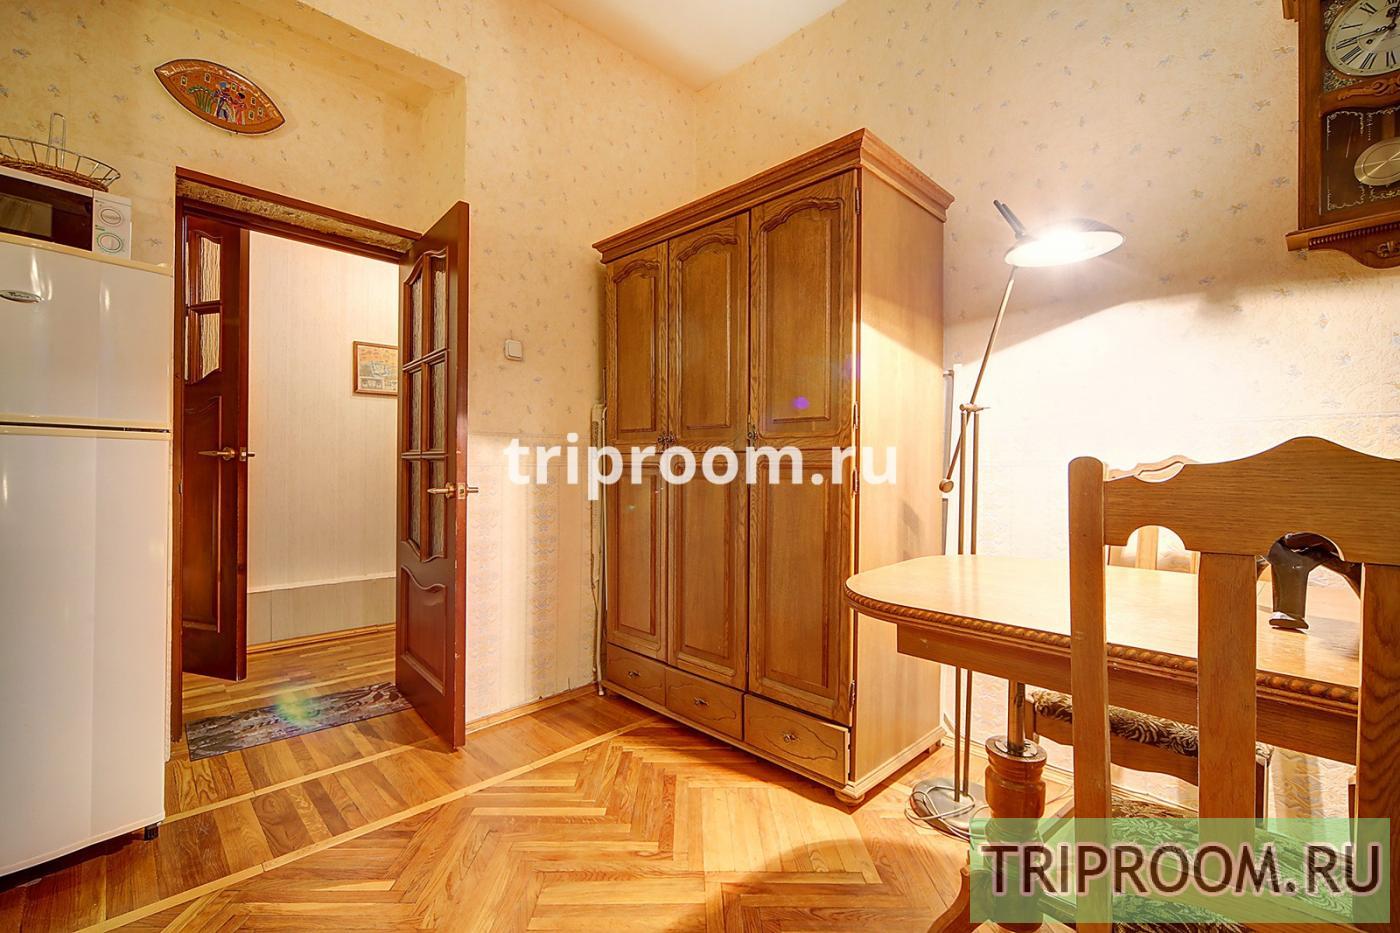 1-комнатная квартира посуточно (вариант № 15445), ул. Лиговский проспект, фото № 13